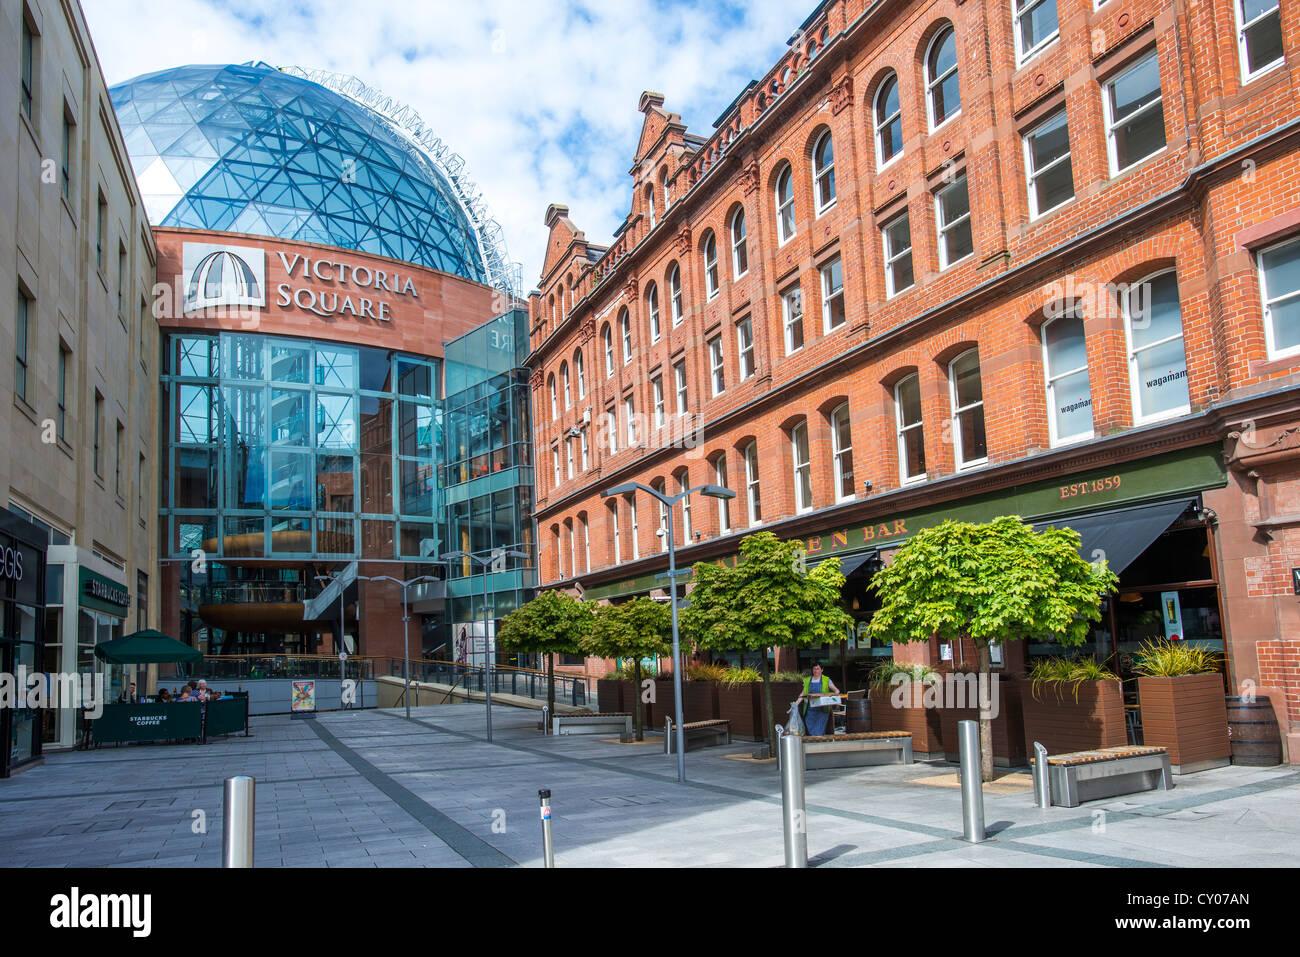 Victoria Square, Belfast, Northern Ireland, United Kingdom, Europe - Stock Image